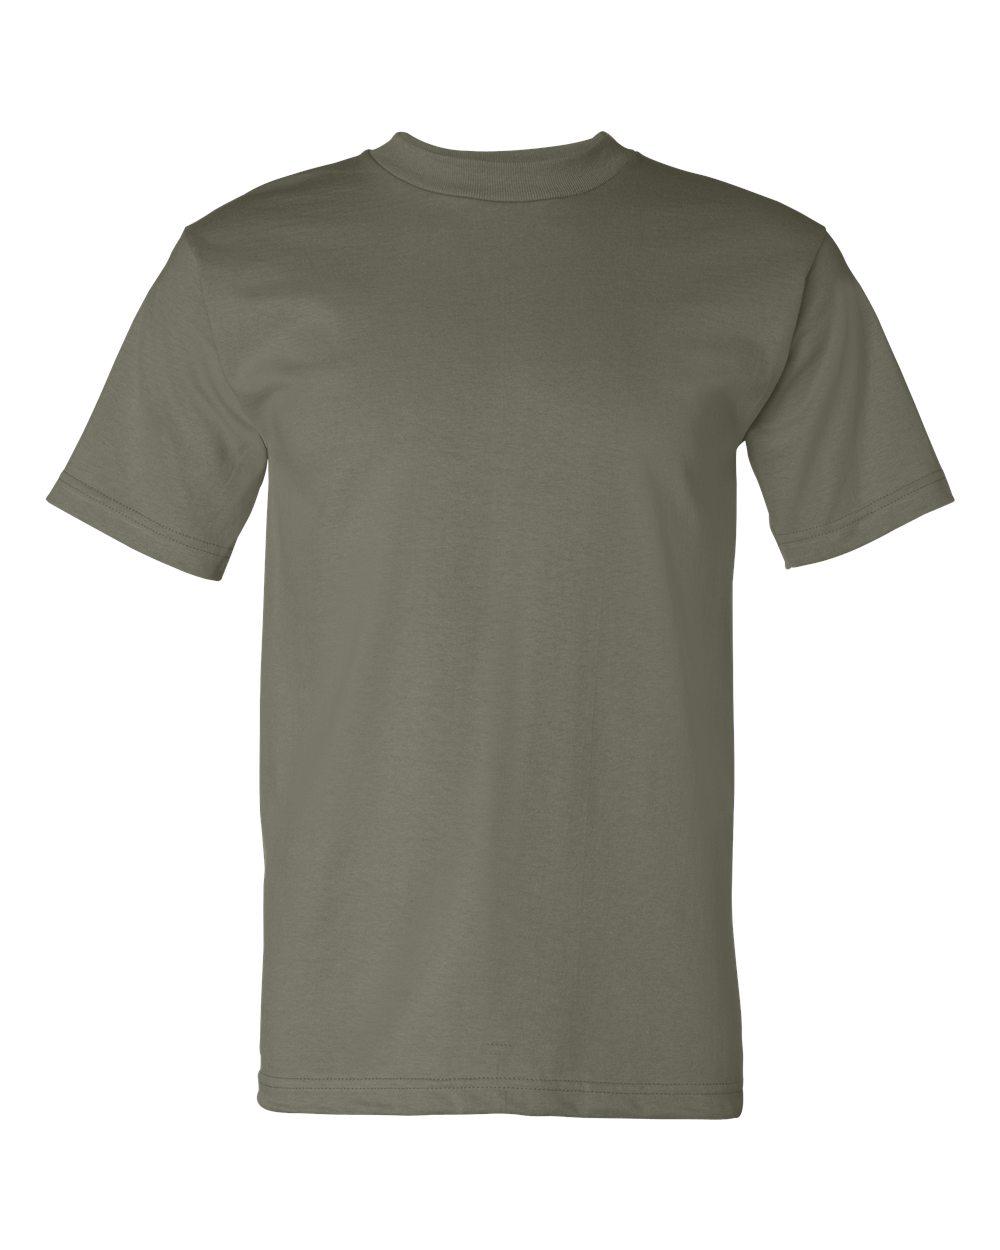 Bayside-Mens-Cotton-Blank-USA-Made-Short-Sleeve-T-Shirt-5100-up-to-5XL thumbnail 39